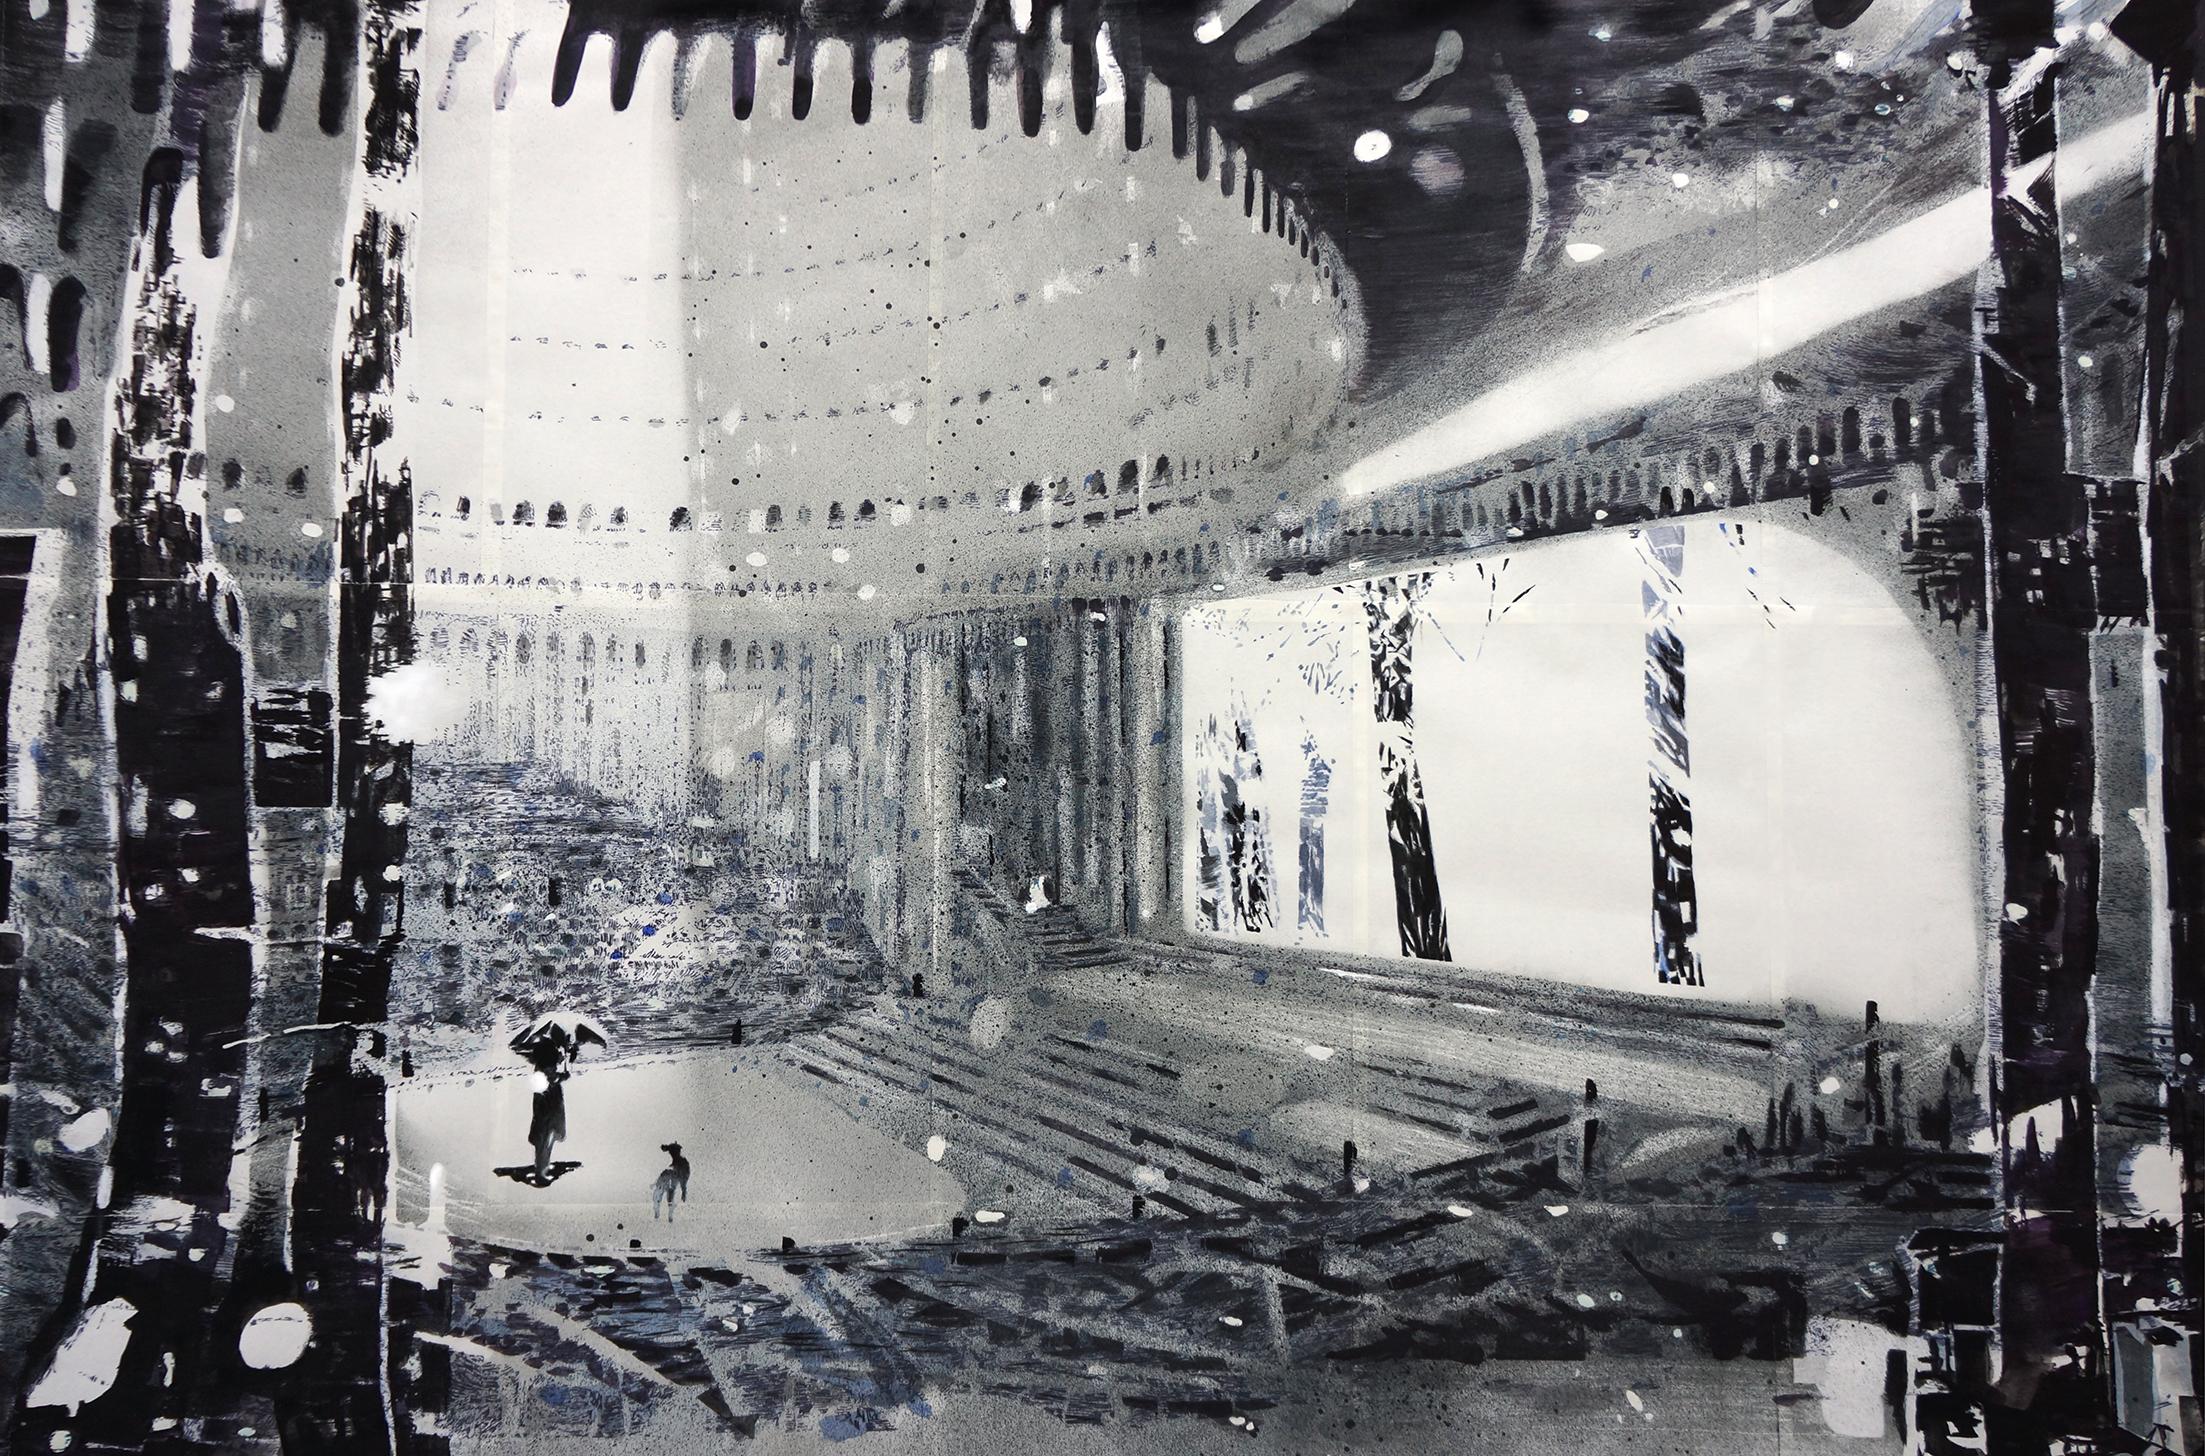 Opera_house#25 (After Hans Poelzig Grosses Schauspielhaus) - Potlood, inkt, aquarel & gouache op papier - 67 x 99,3 cm